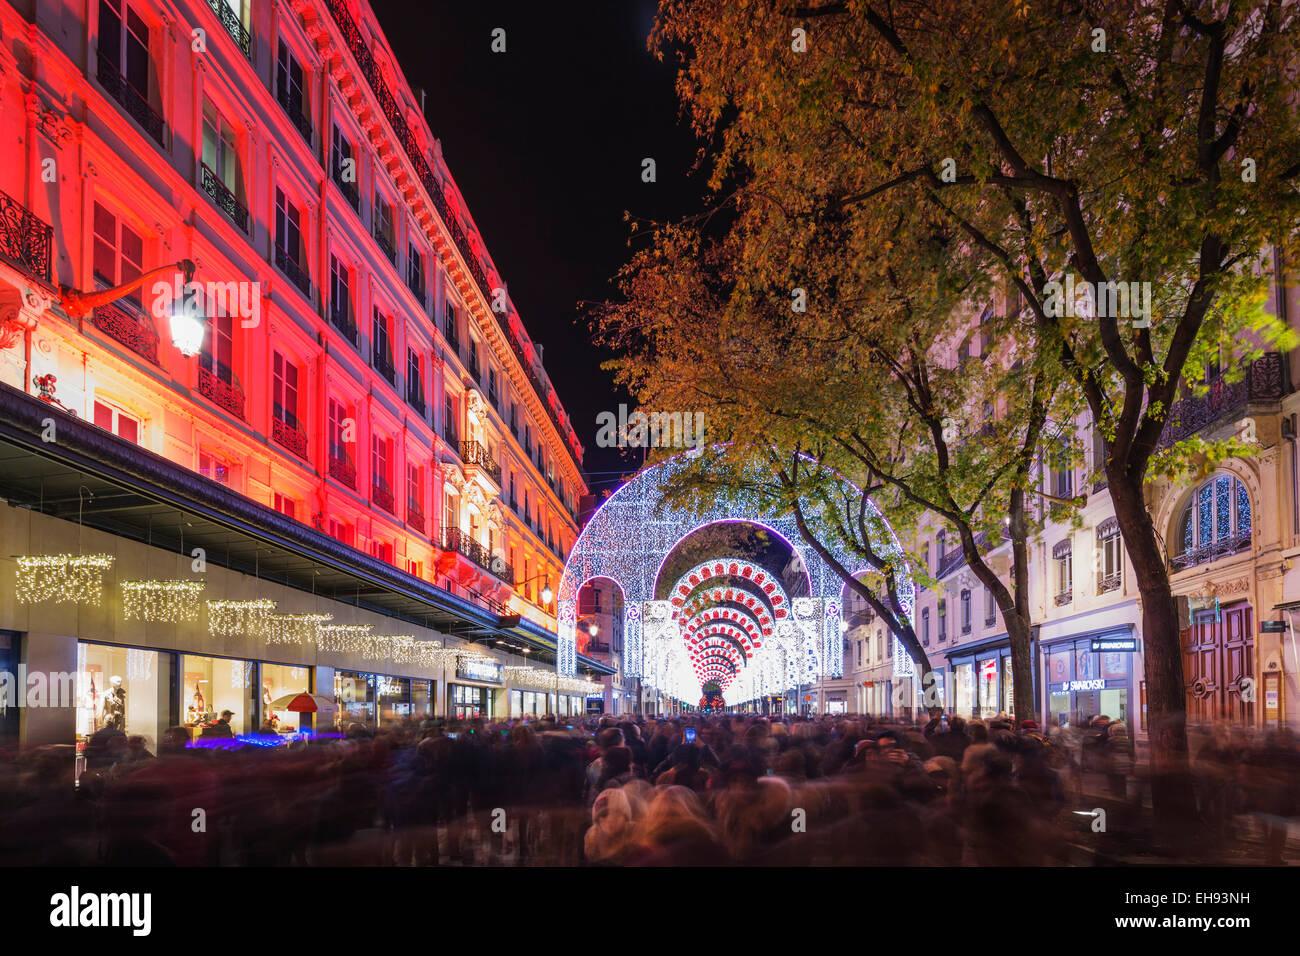 Europe, France, Rhone-Alpes, Lyon, Fete des Lumieres, festival of lights - Stock Image